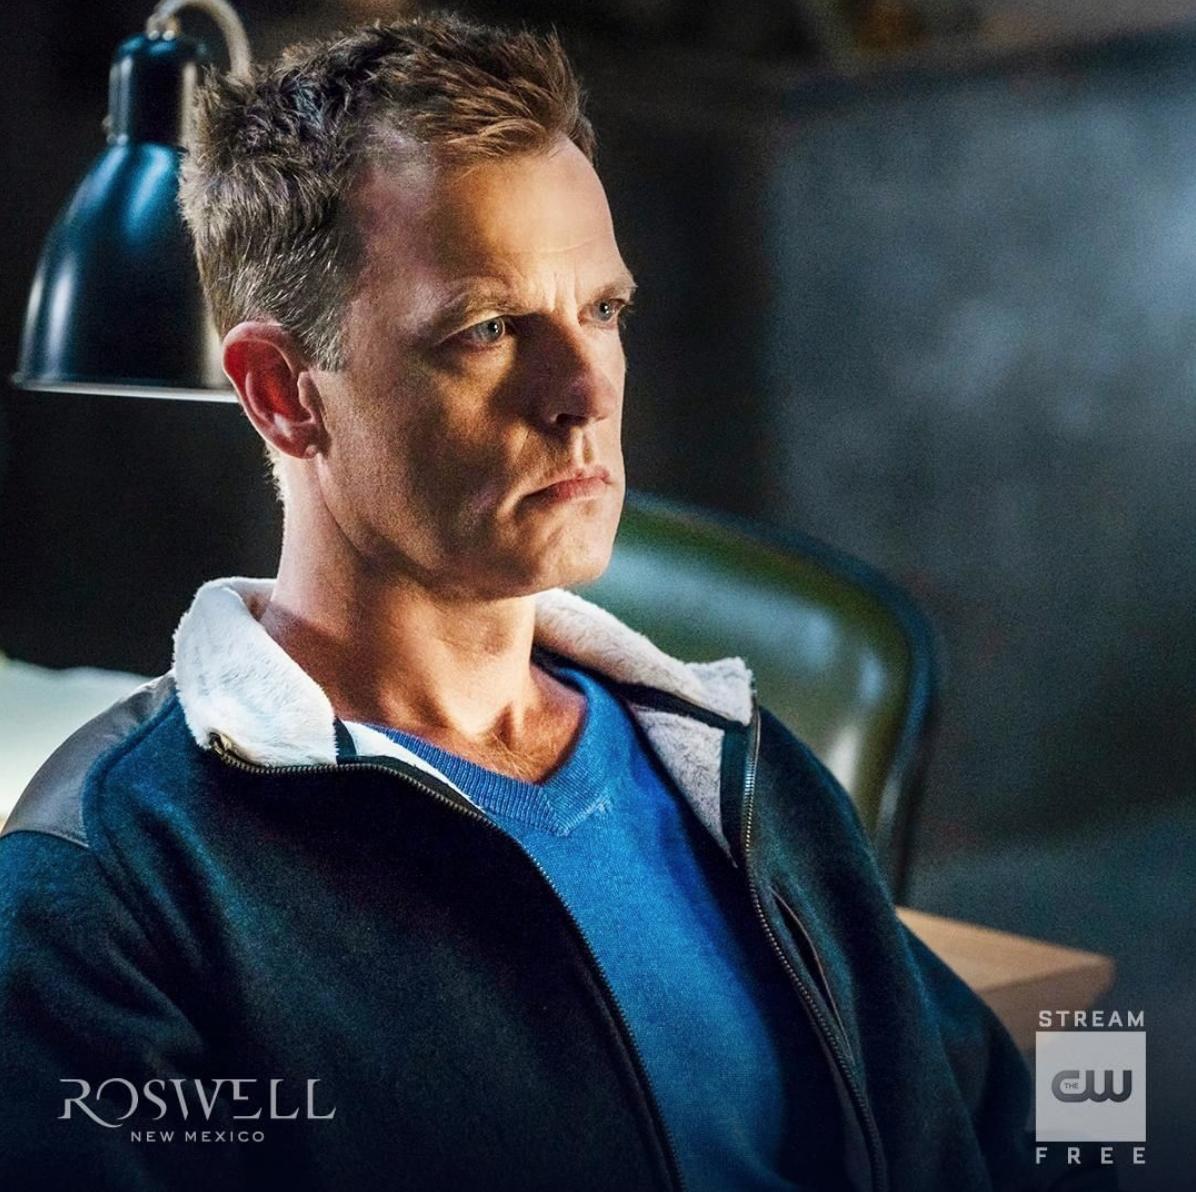 roswell instagram